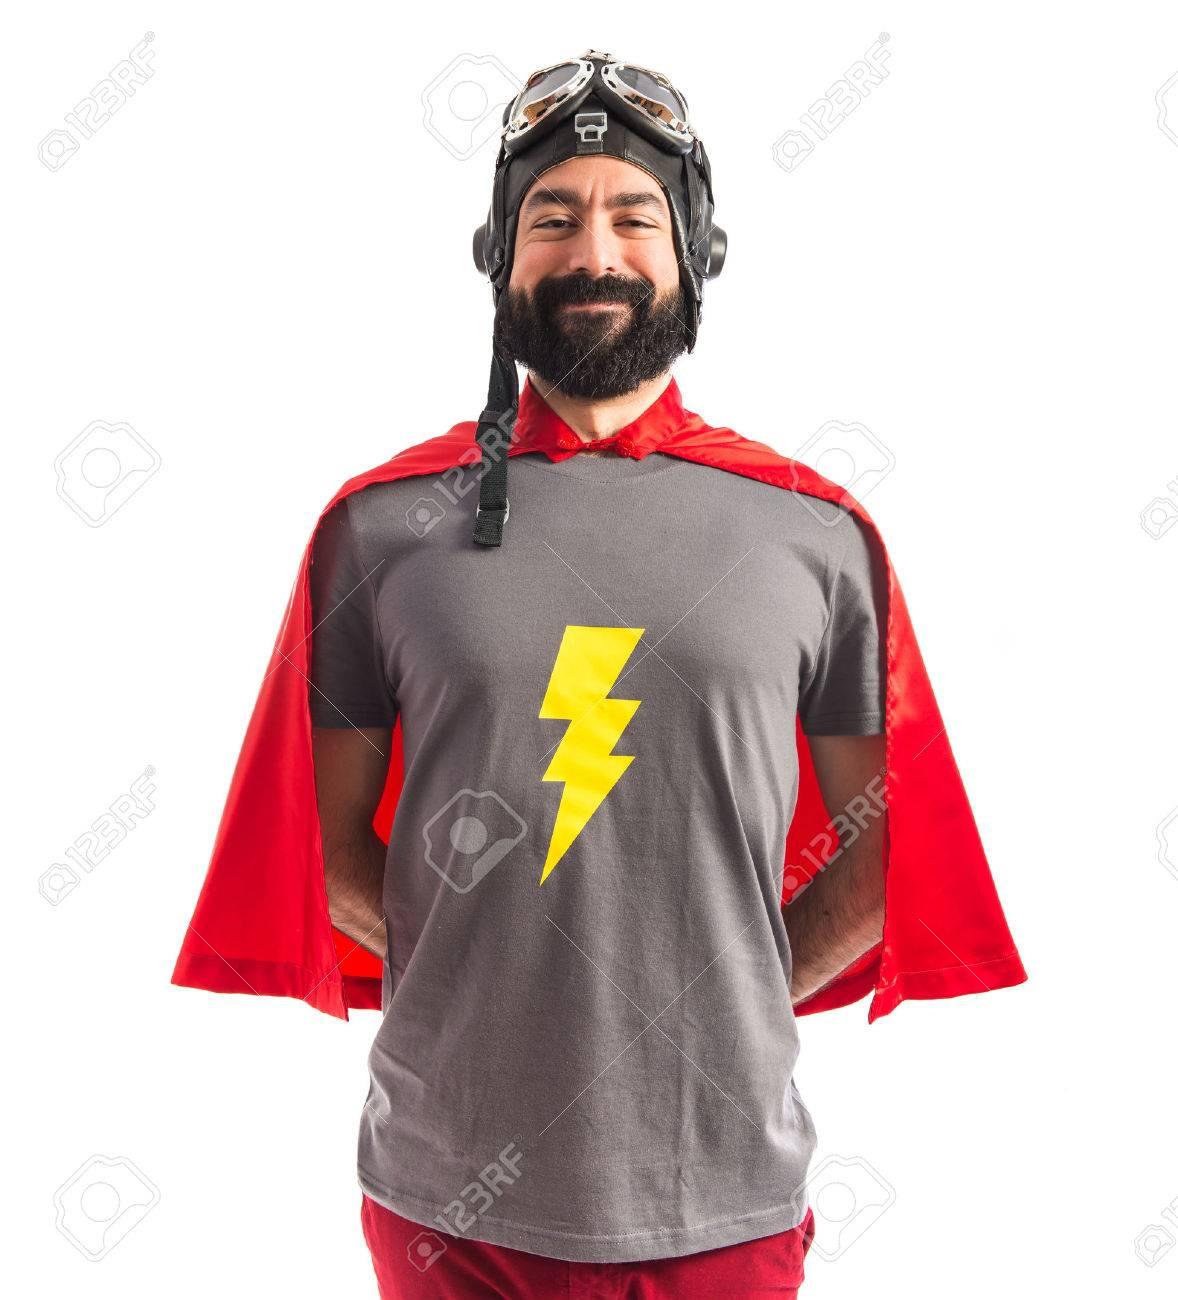 Superhero over white - 40412318